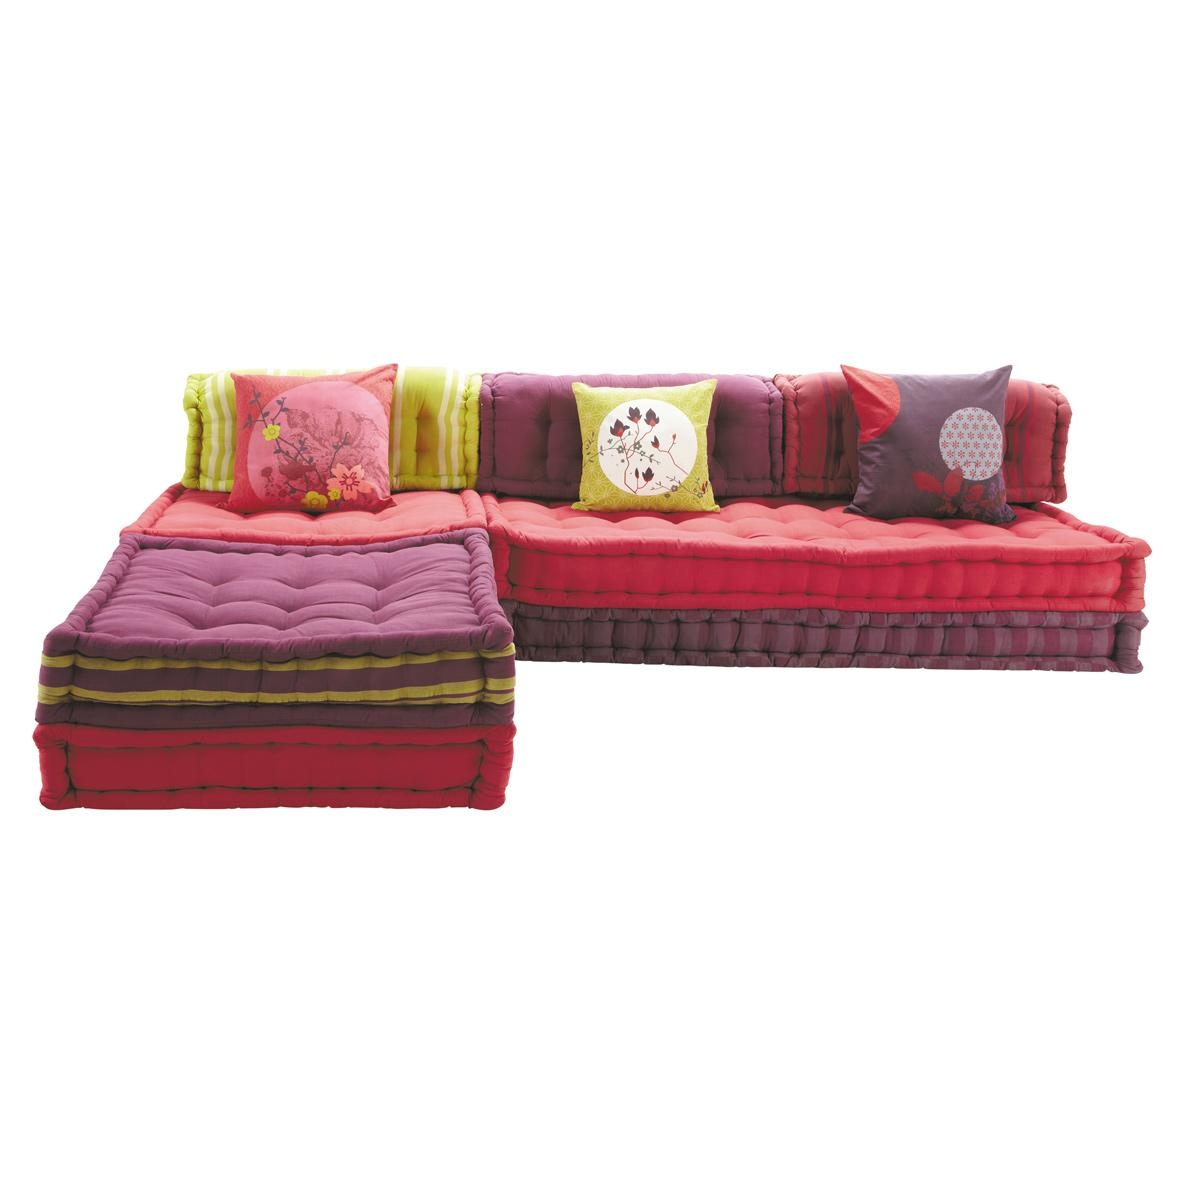 Modular Sofa Modern : How To Disassemble Modular Sofa Sectional Inside Modular Sofas (View 15 of 20)